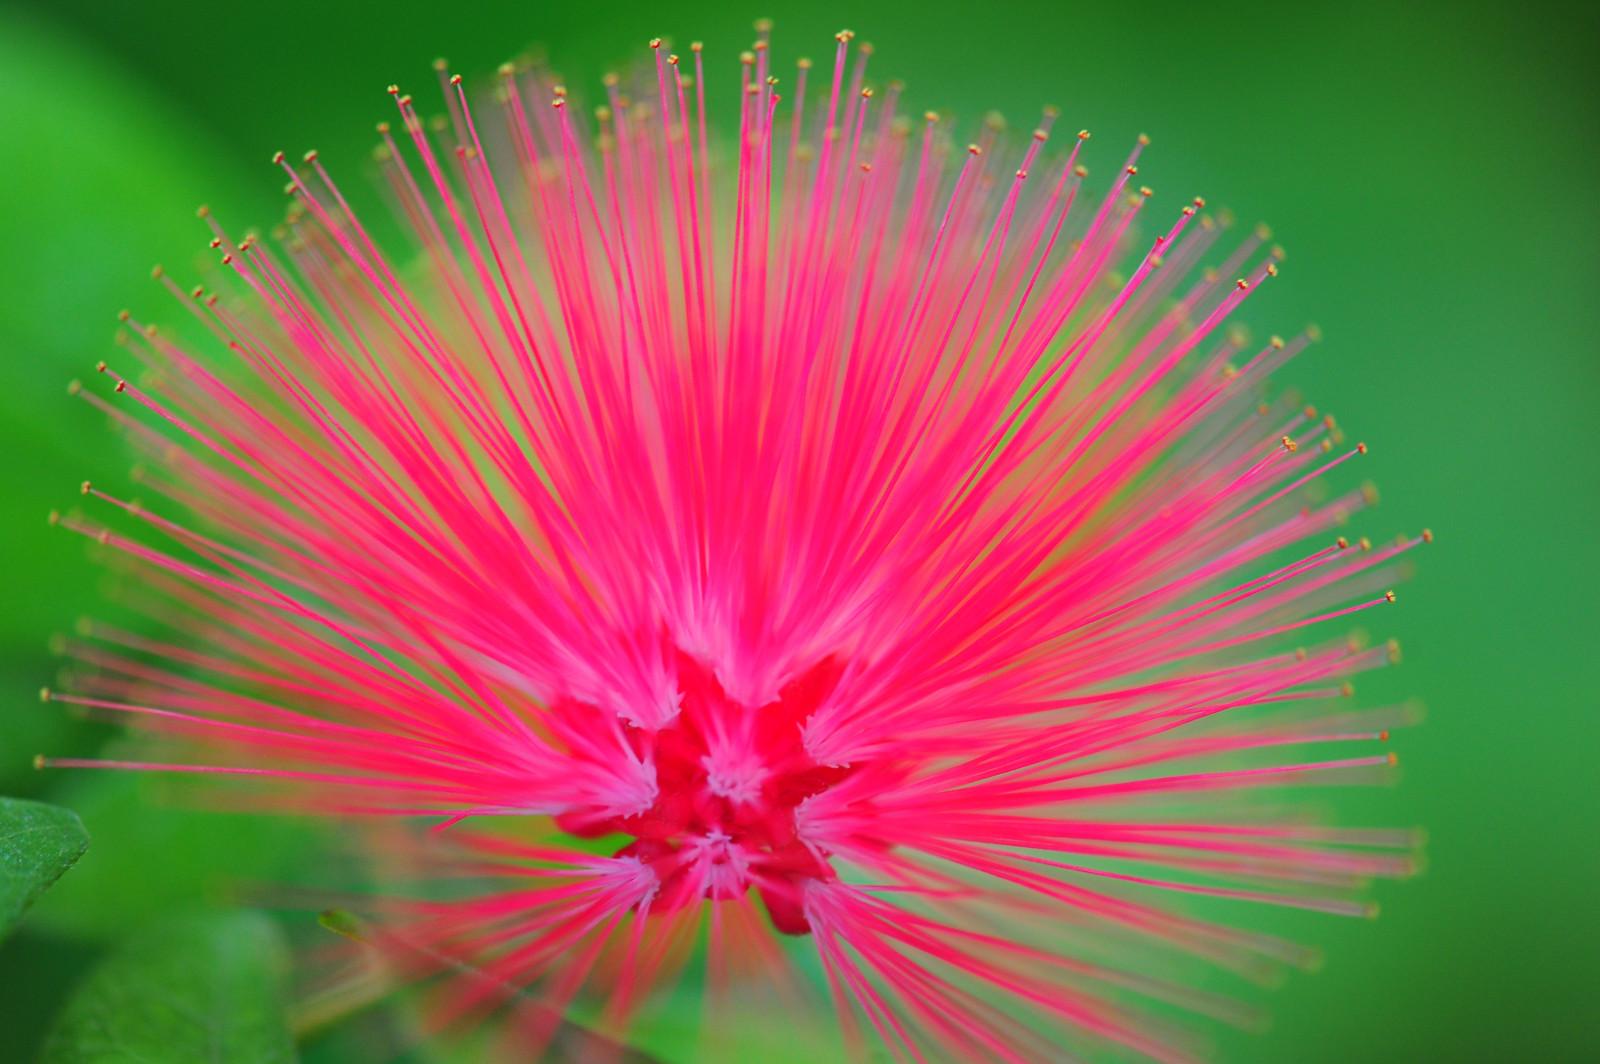 Wallpaper Flowers Plants Macro Gardens Nikon Pinkfloyd